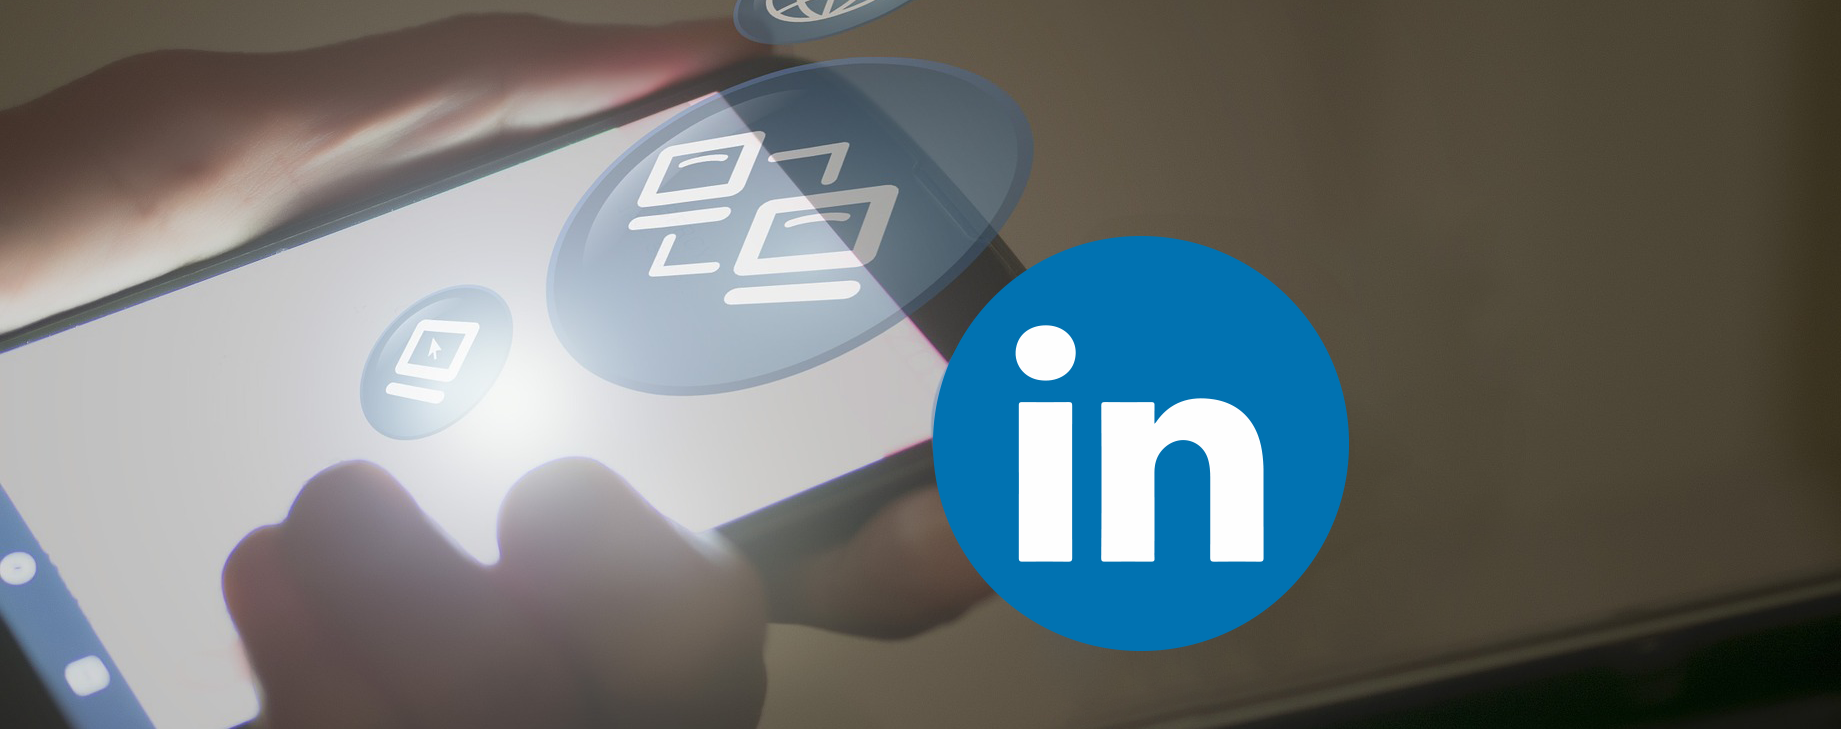 Linkedin logo on a mobile phone